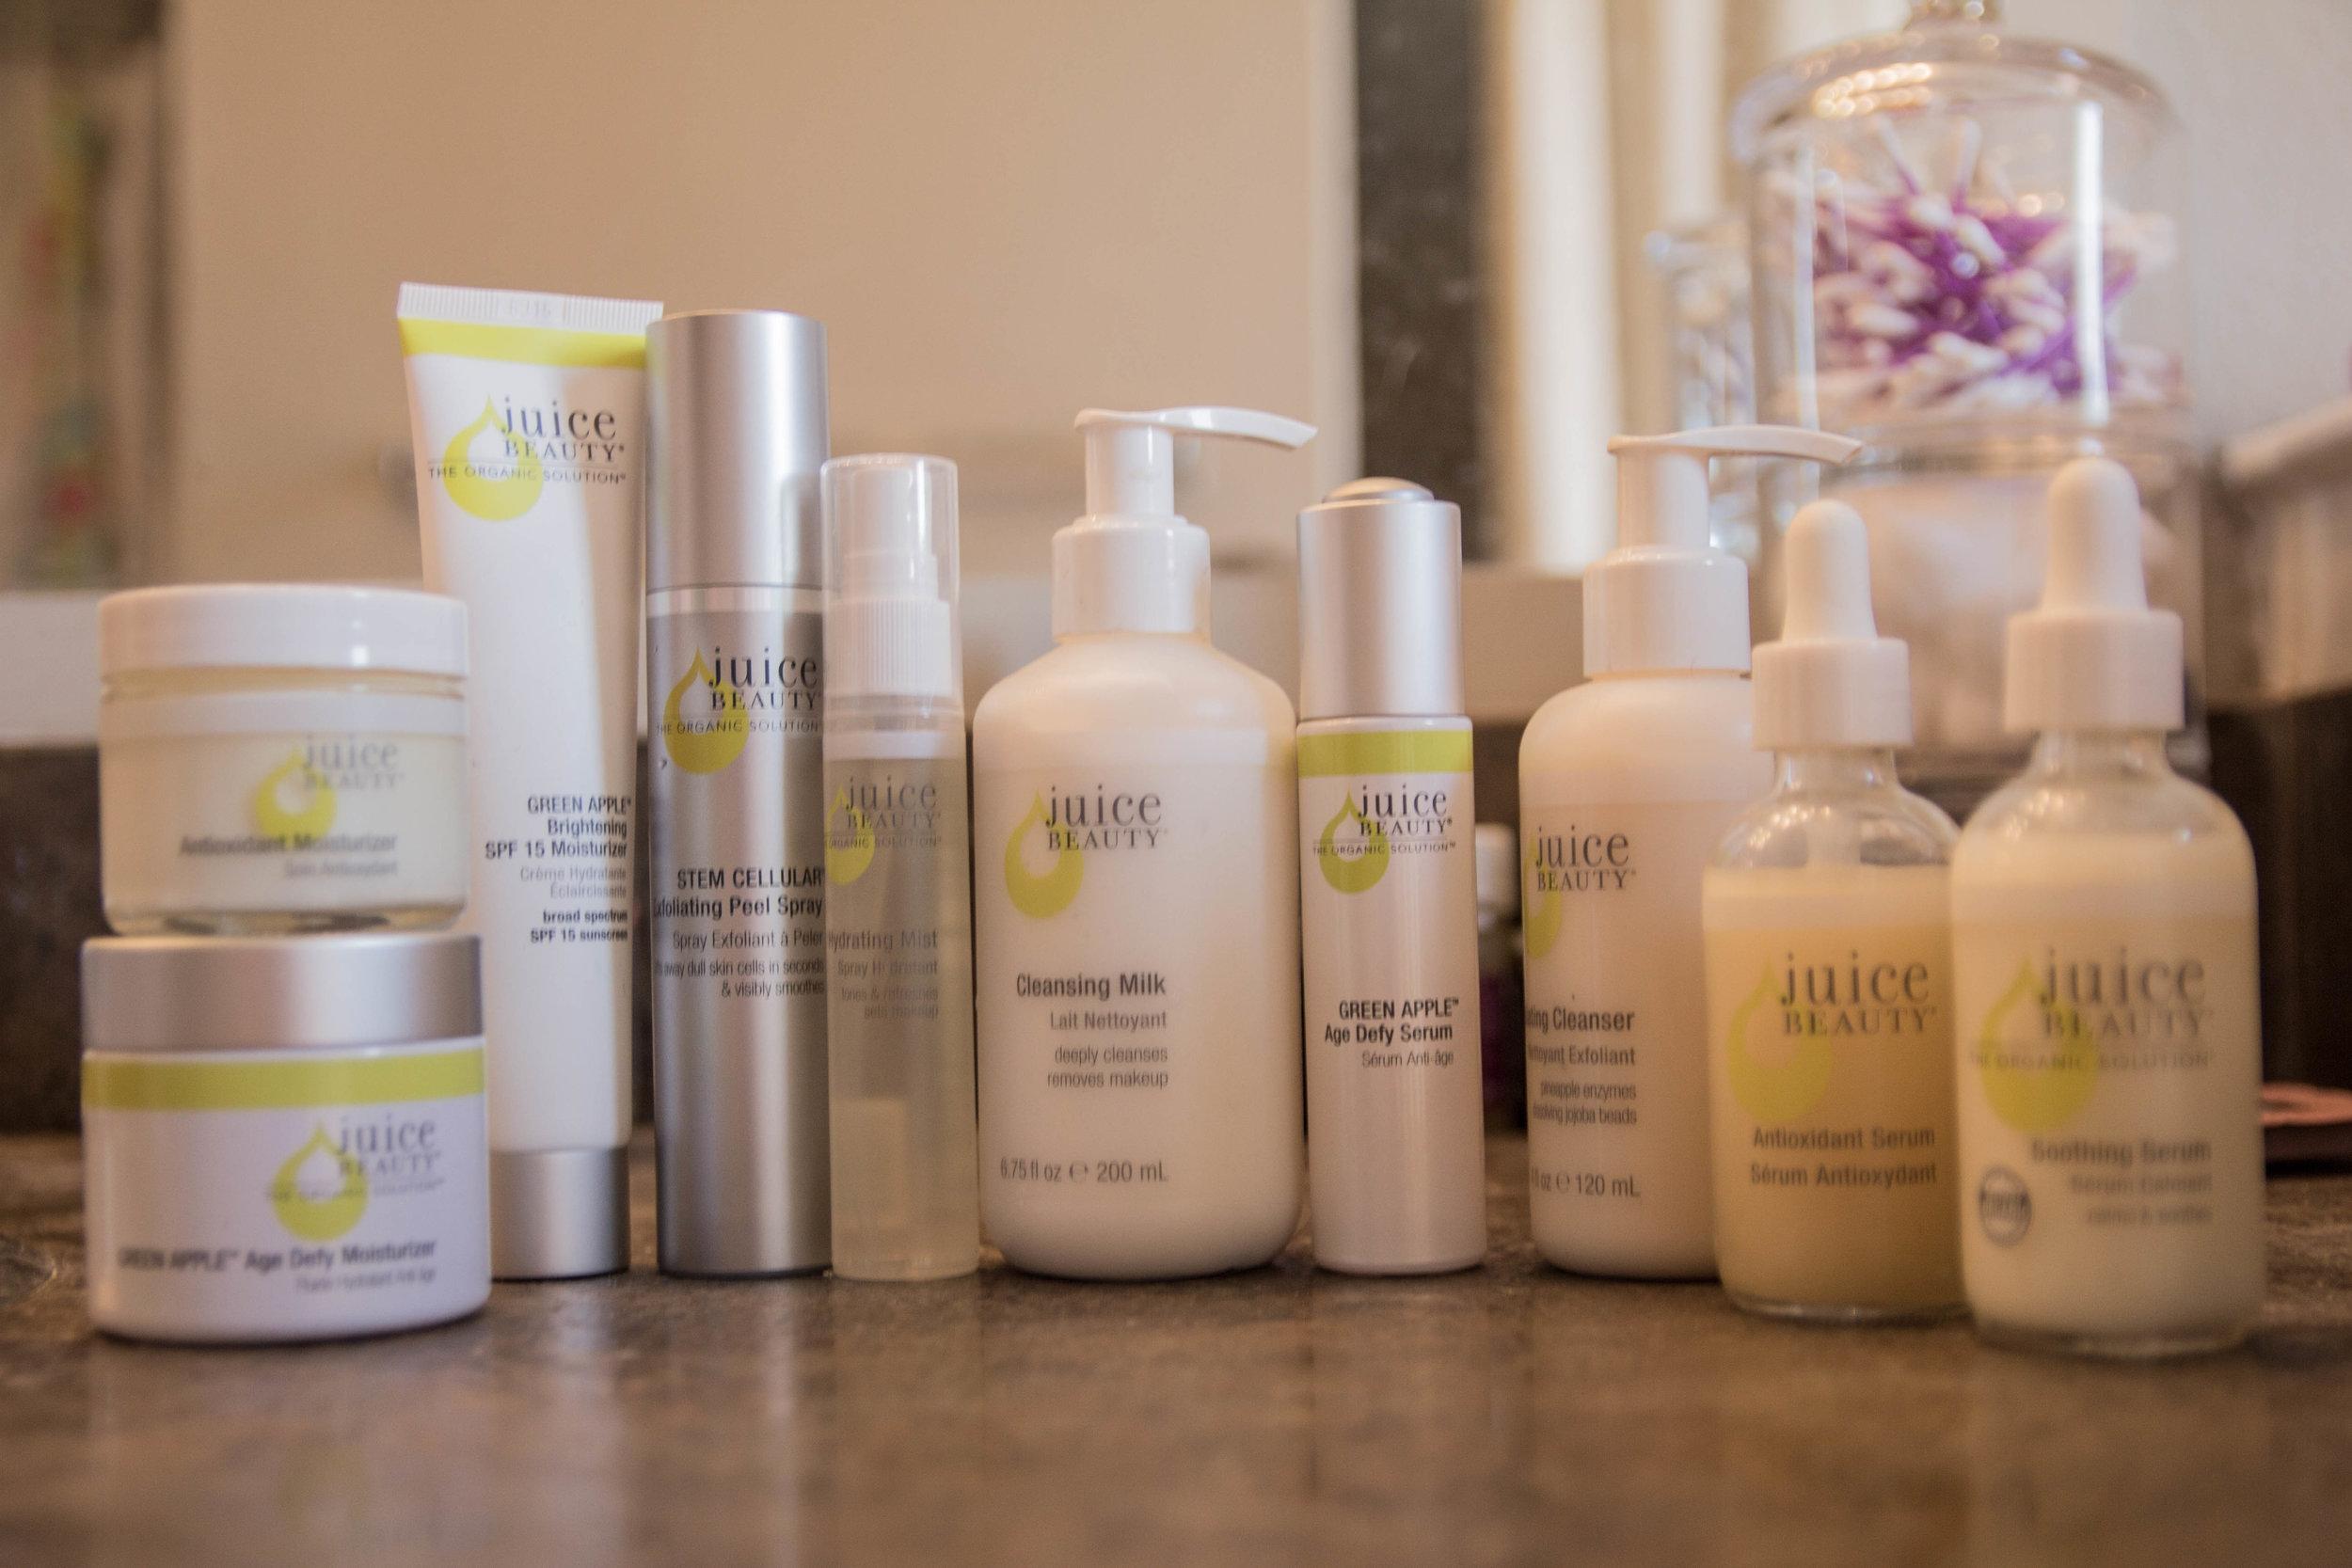 juice beauty, cruelty free, vegan, natural skin care, skincare, organic, skin tups, the best skin care, my current skin care routine